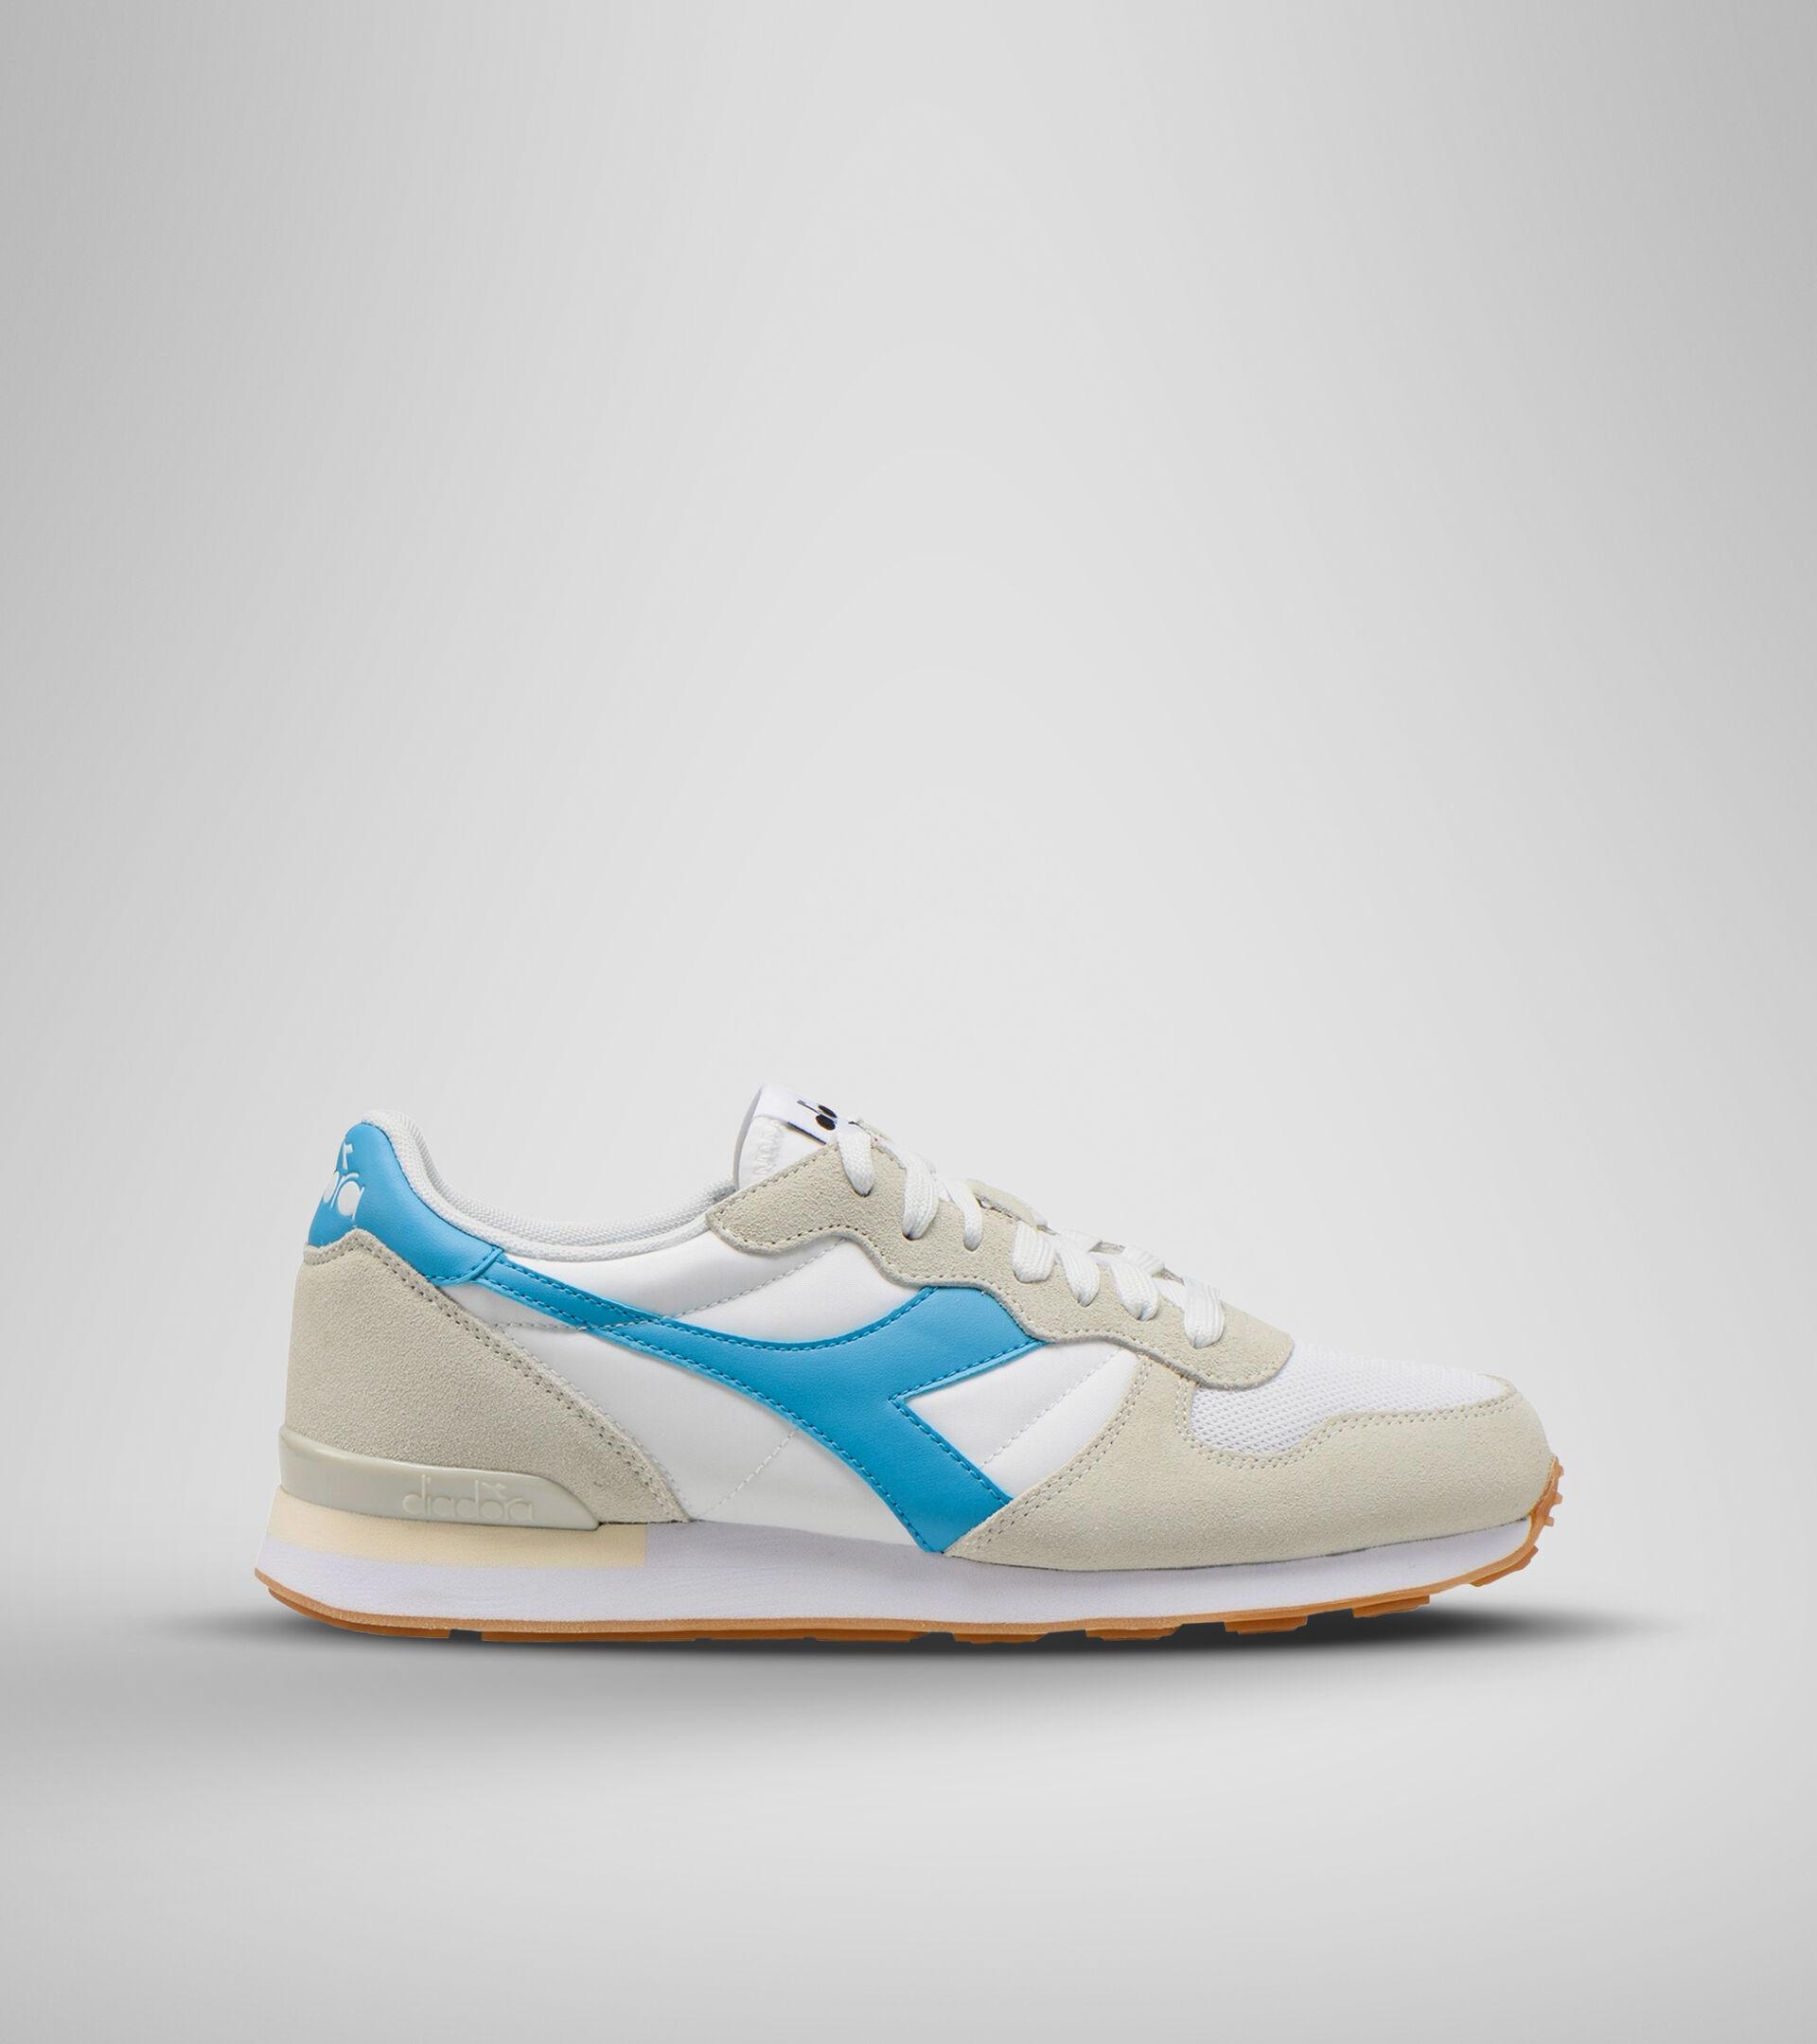 Footwear Sportswear UNISEX CAMARO WHITE/CYAN BLUE Diadora